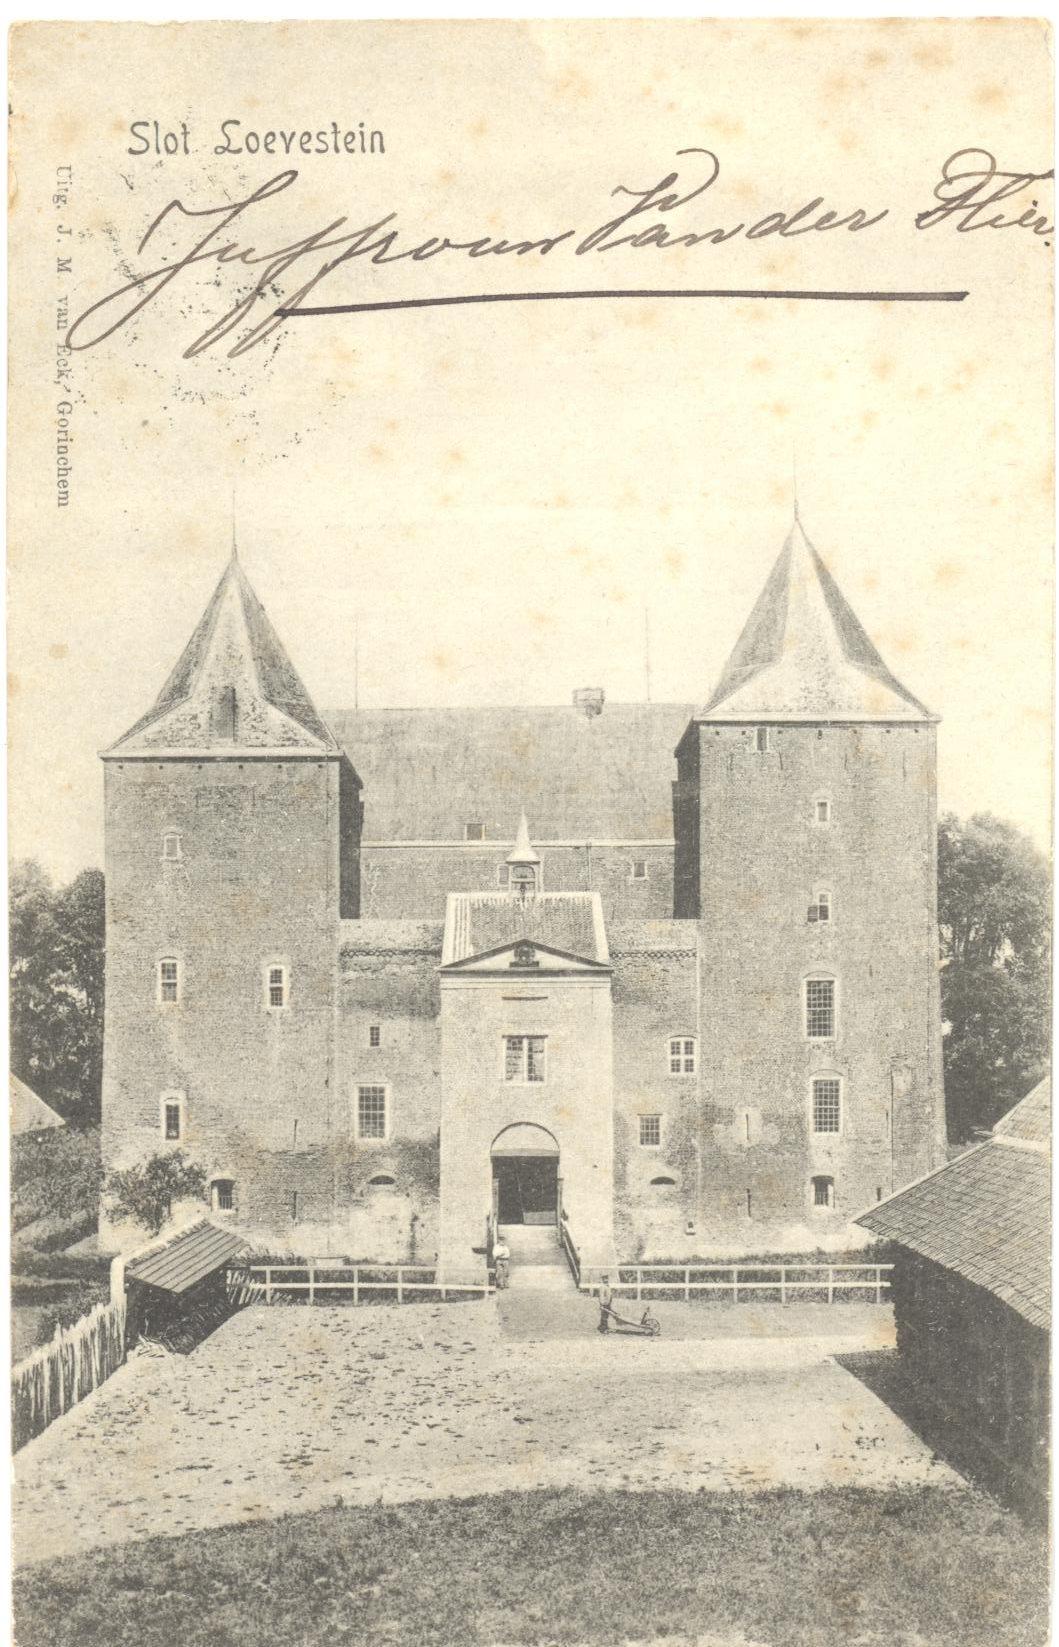 Slot-Loevestein-A11